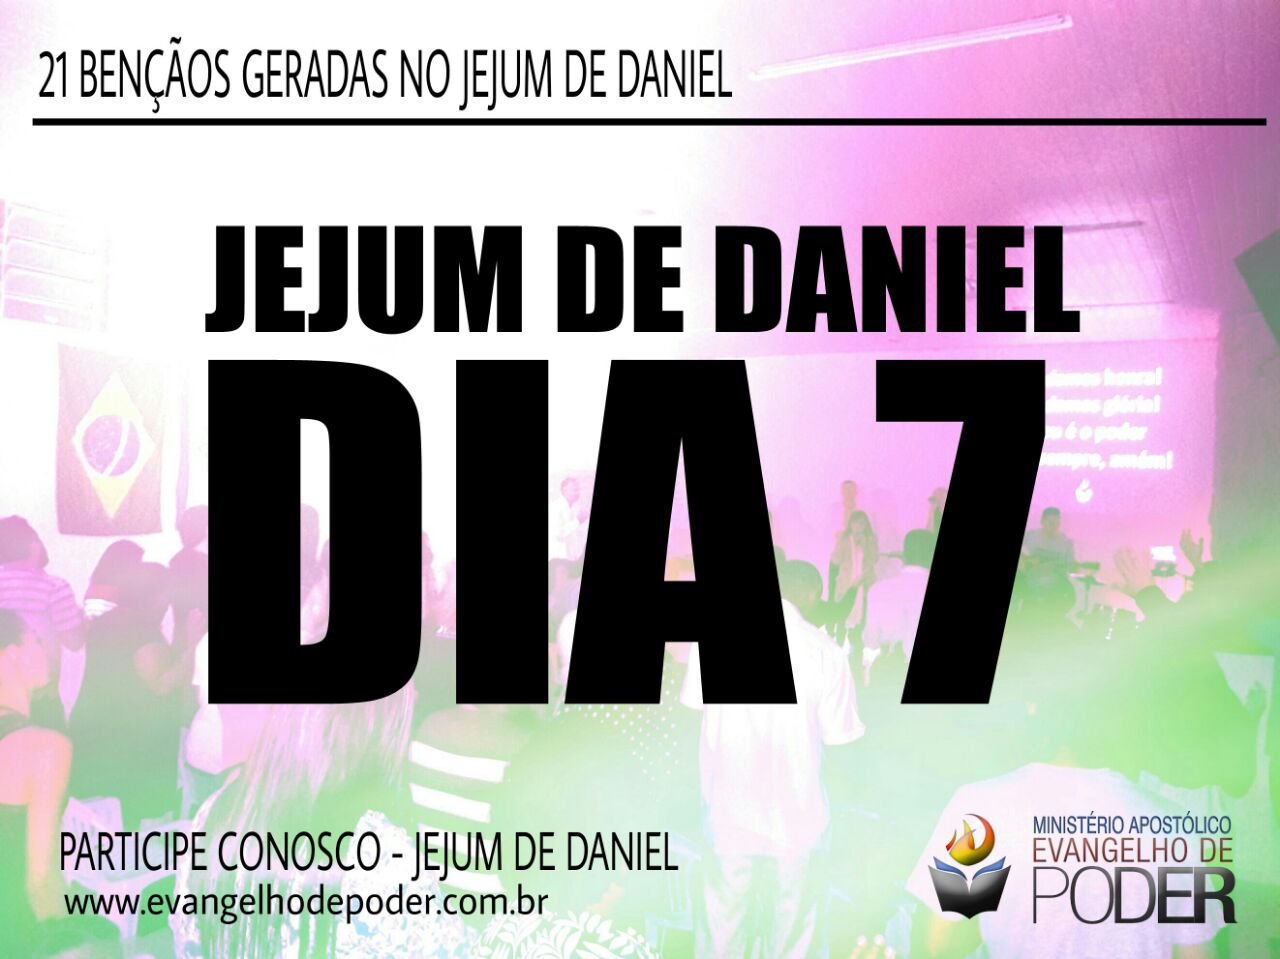 JEJUM DE DANIEL 7° DIA